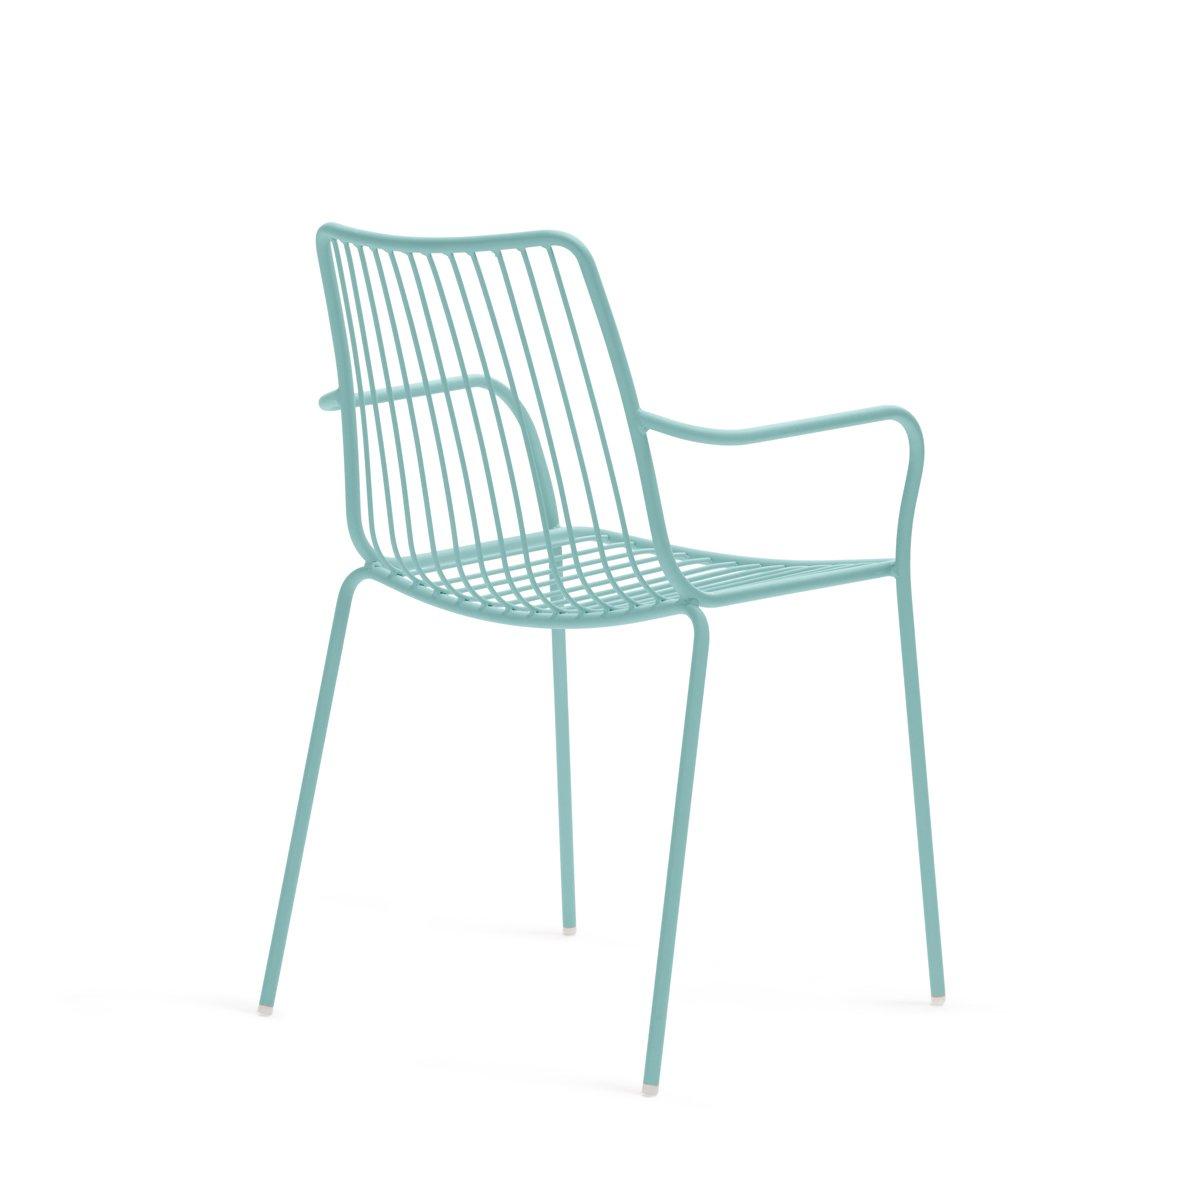 Krzesła na taras oraz do ogrodu Nolita Pedrali